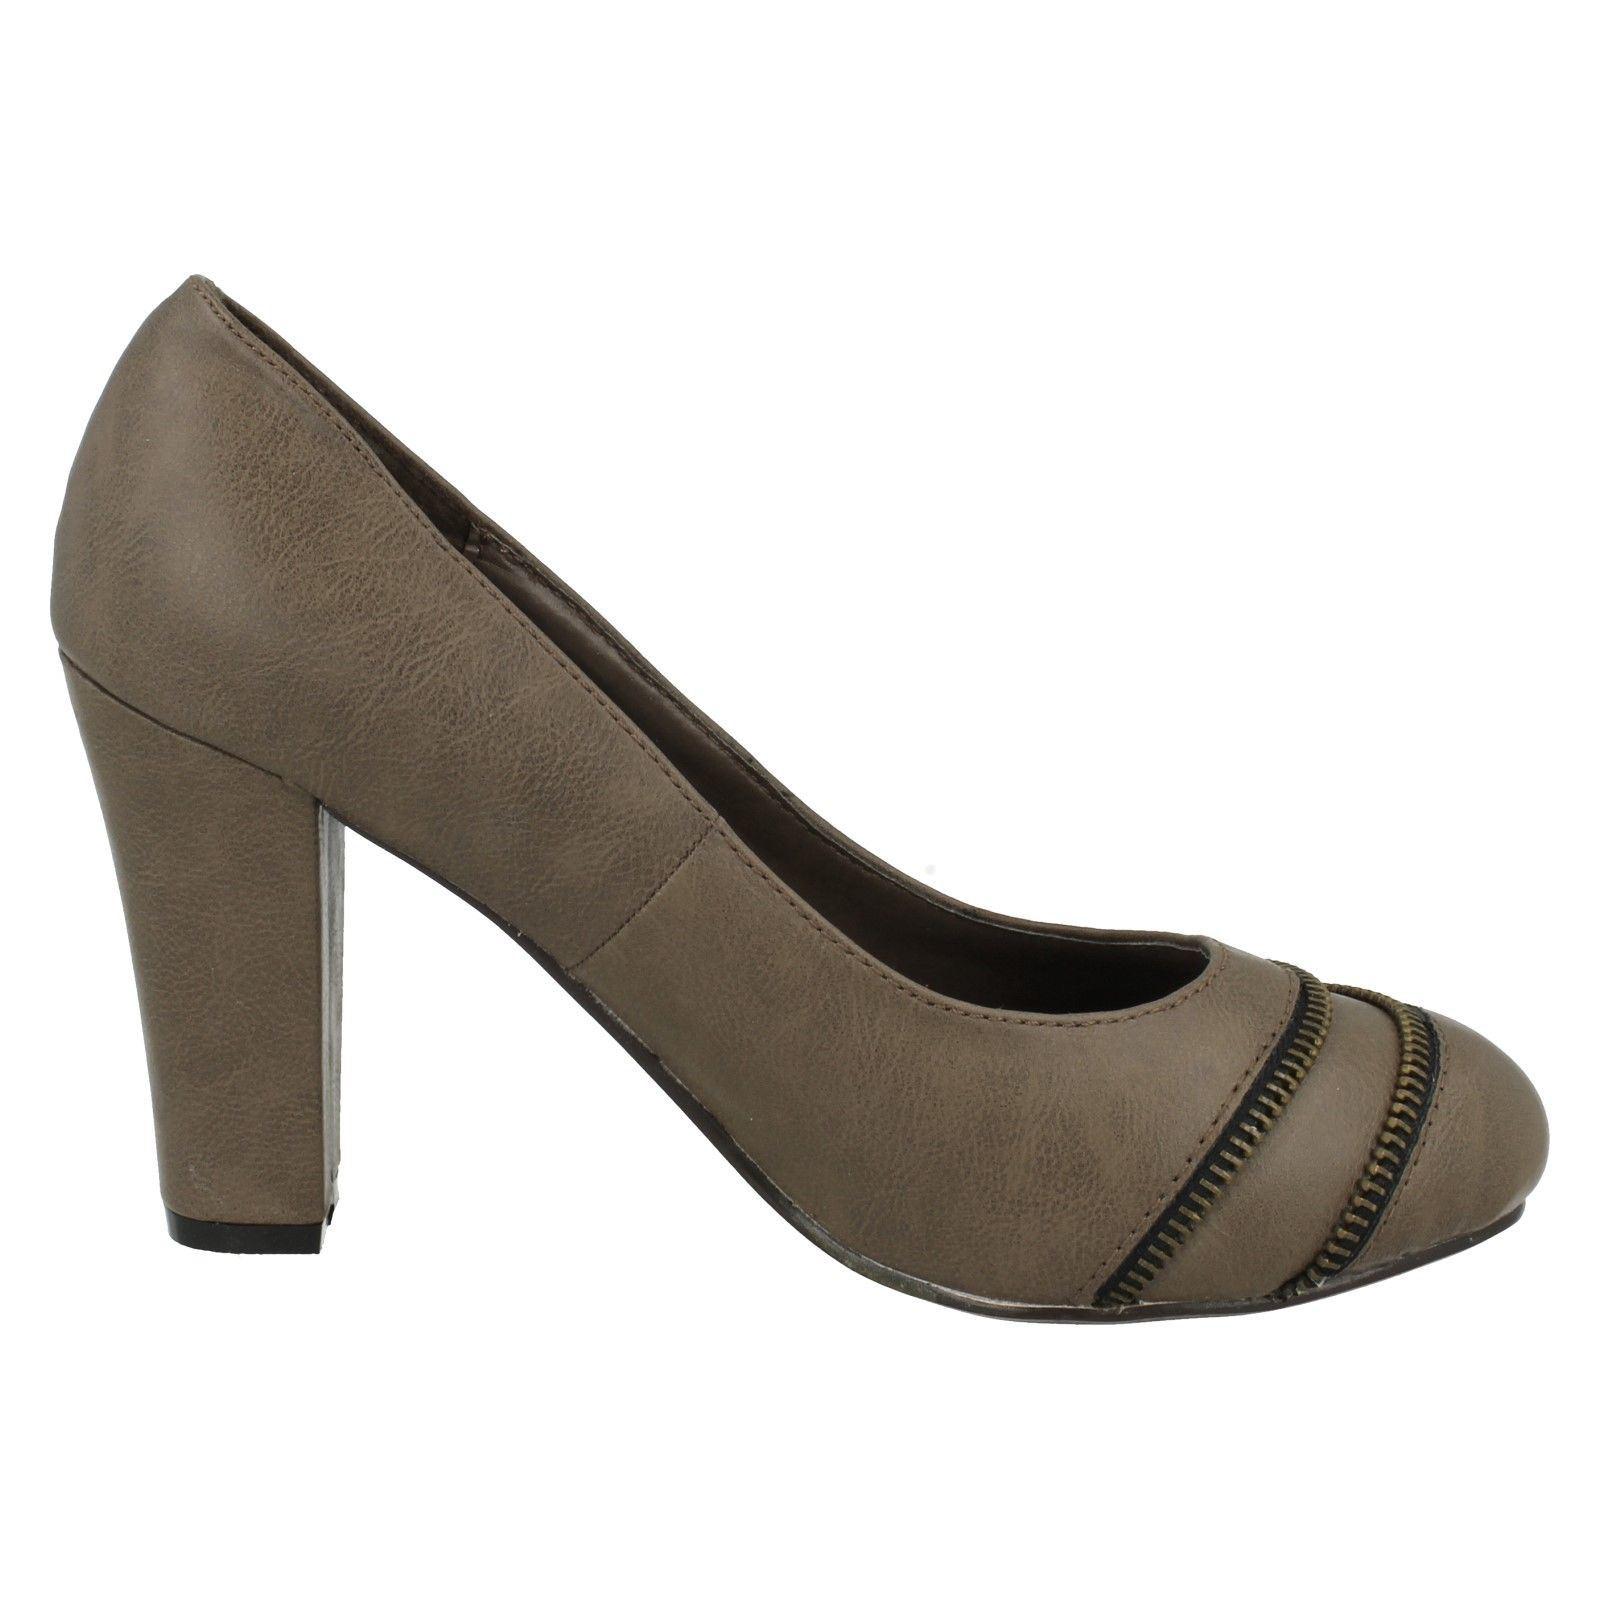 Damas Spot On Tacón Alto Zapatos Tribunal Etiqueta-F9462